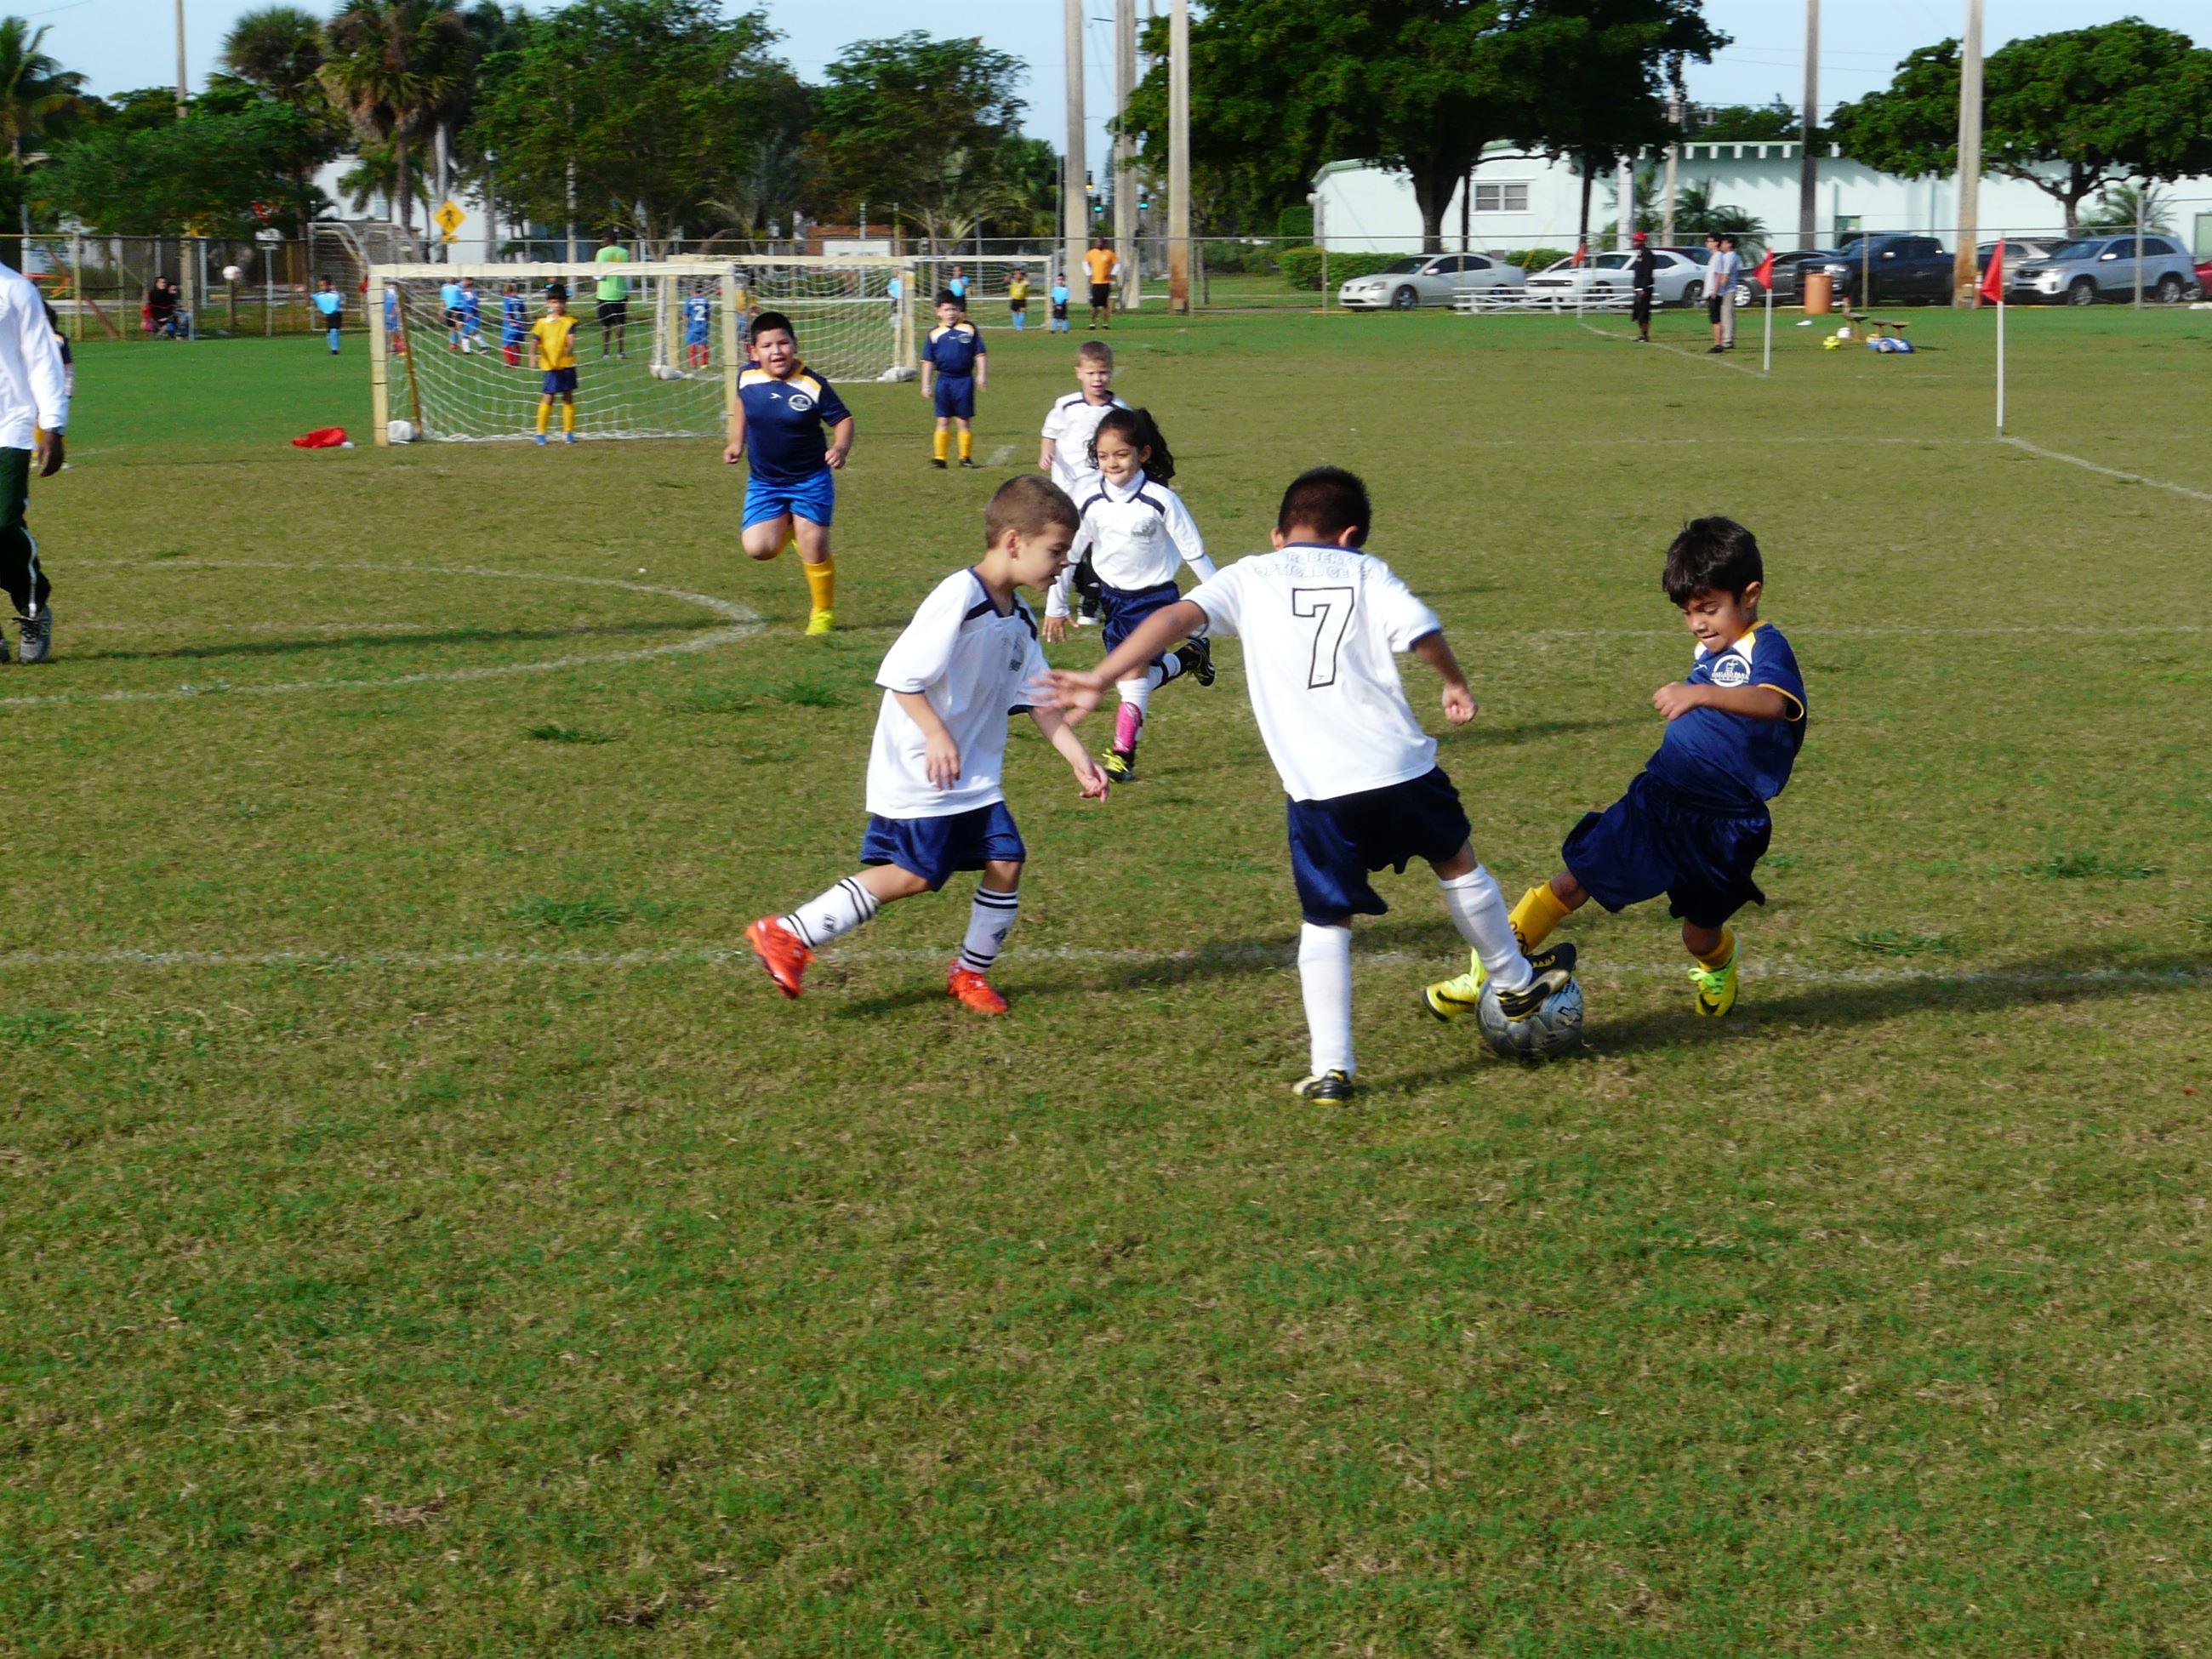 Youth Soccer League | Oakland Park, FL - Official Website